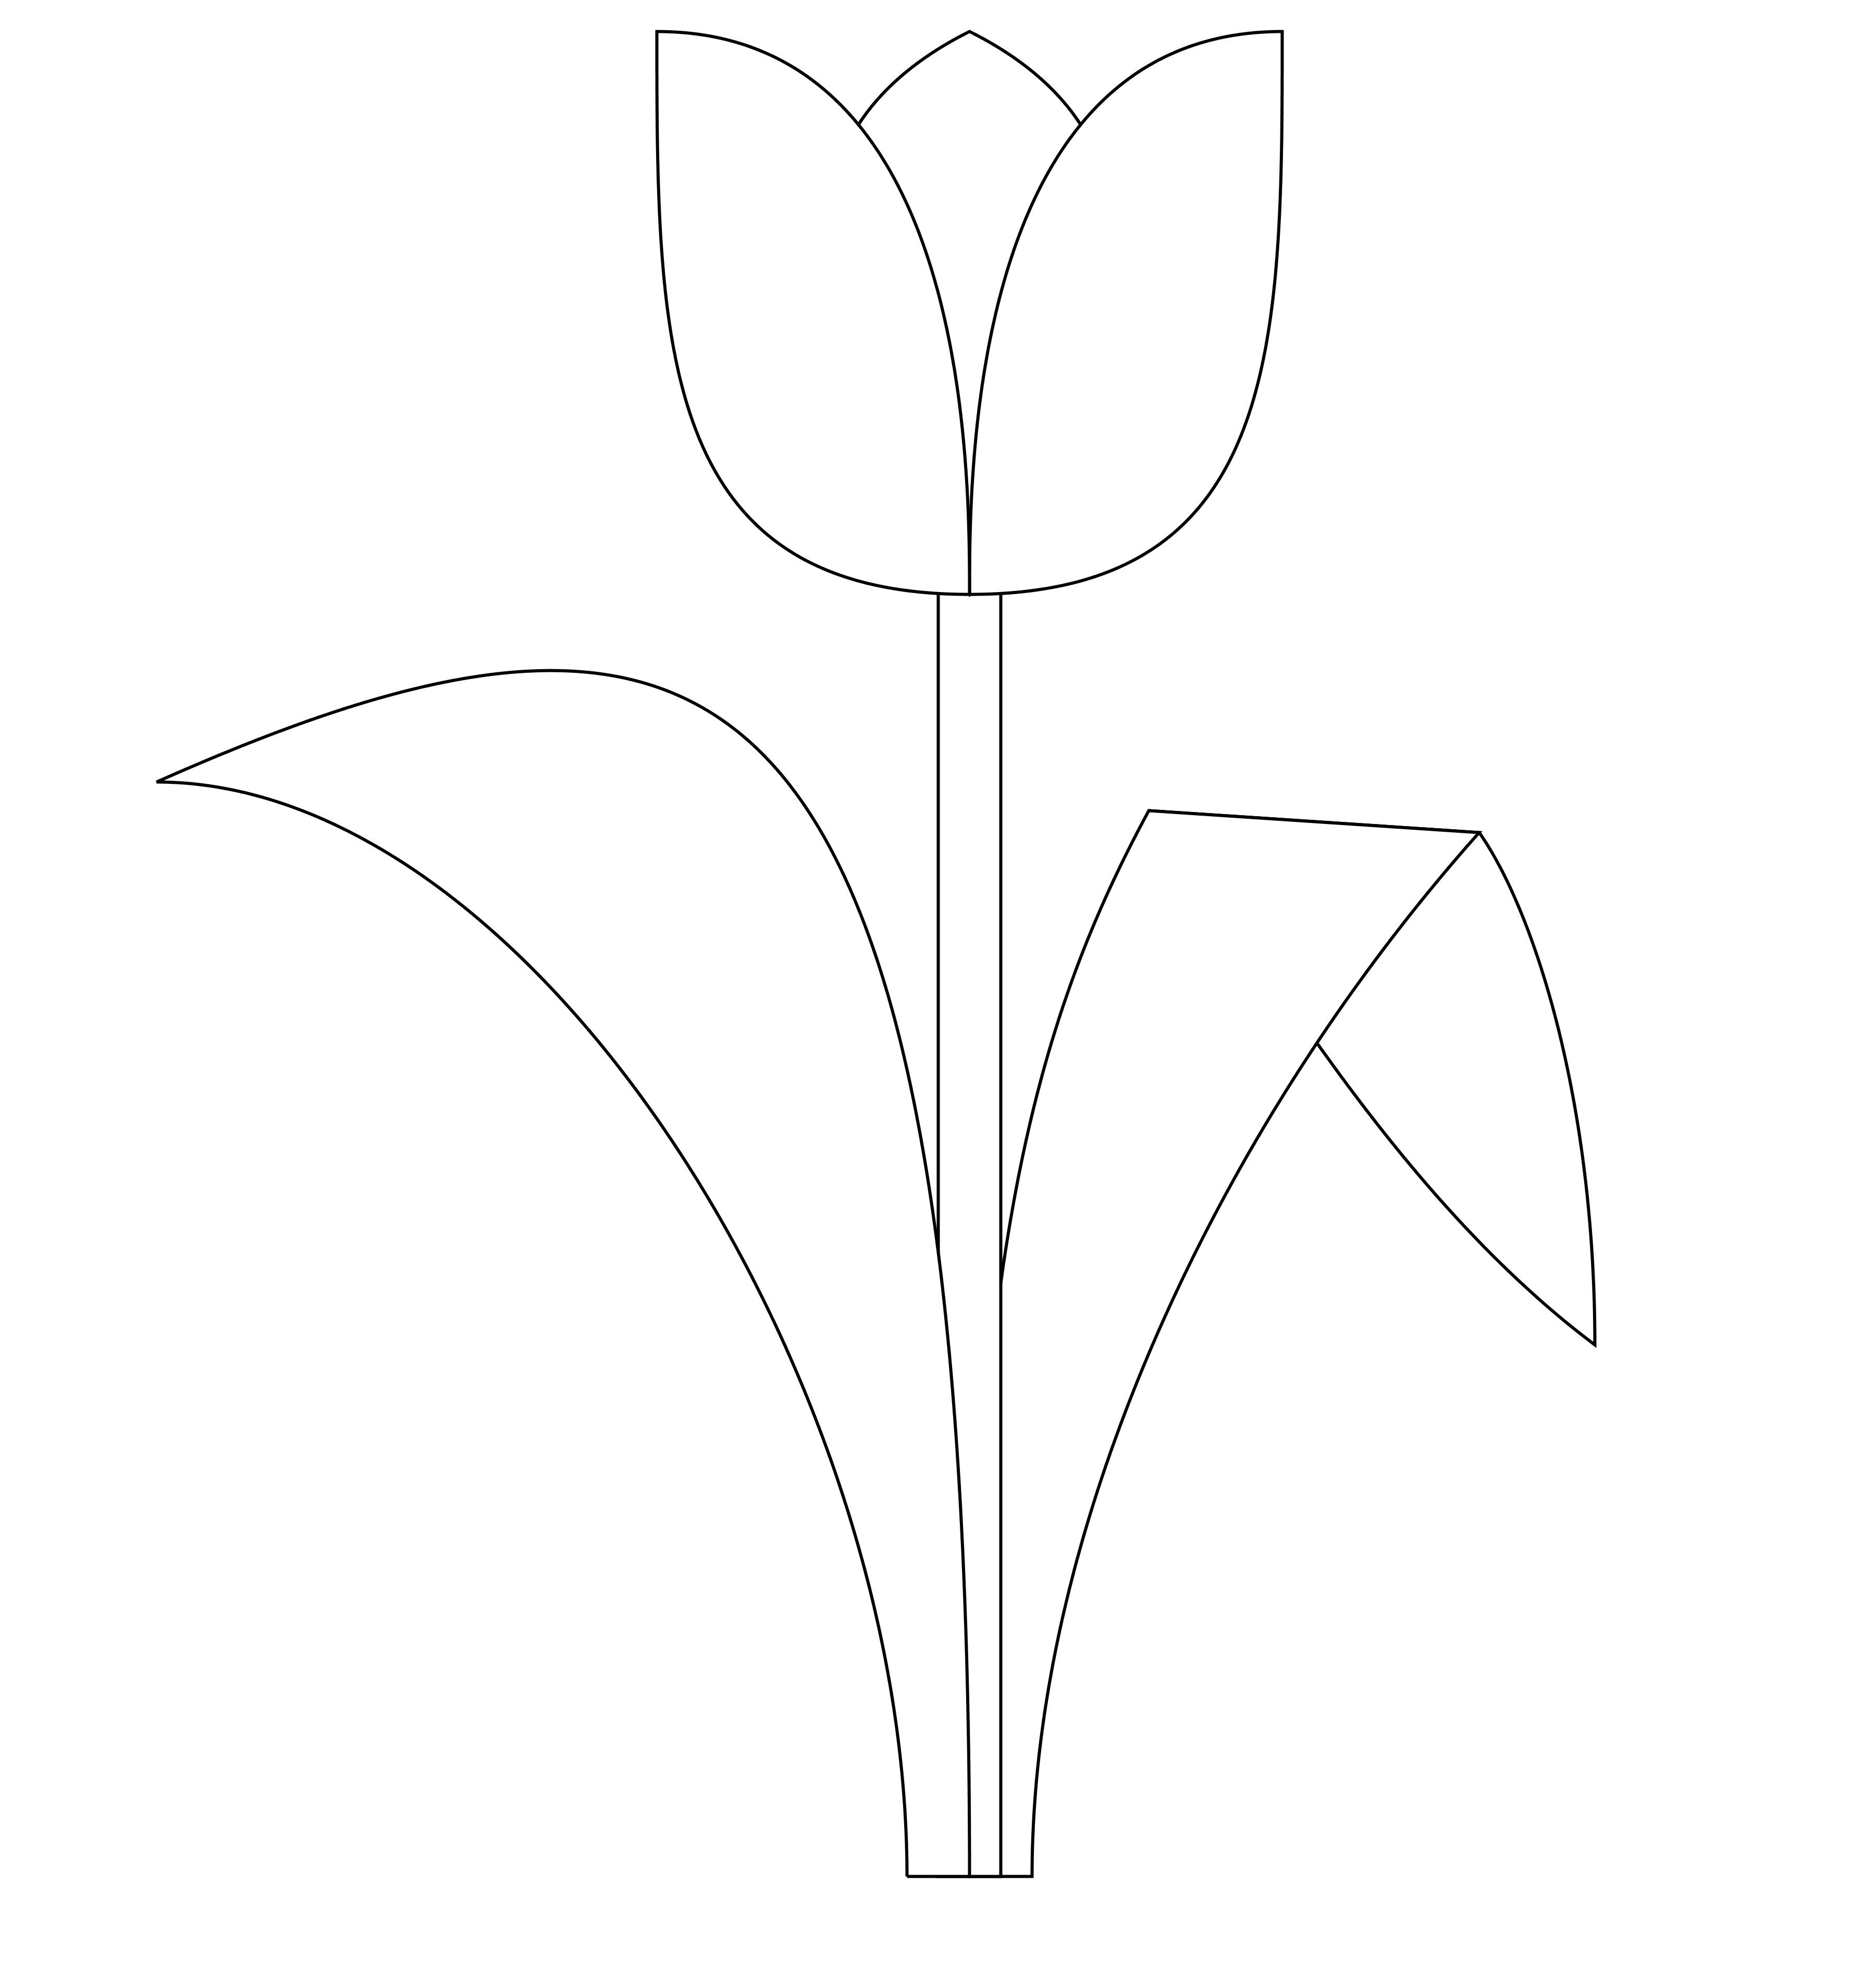 tulip template printable tulip template for kids - 101 ...